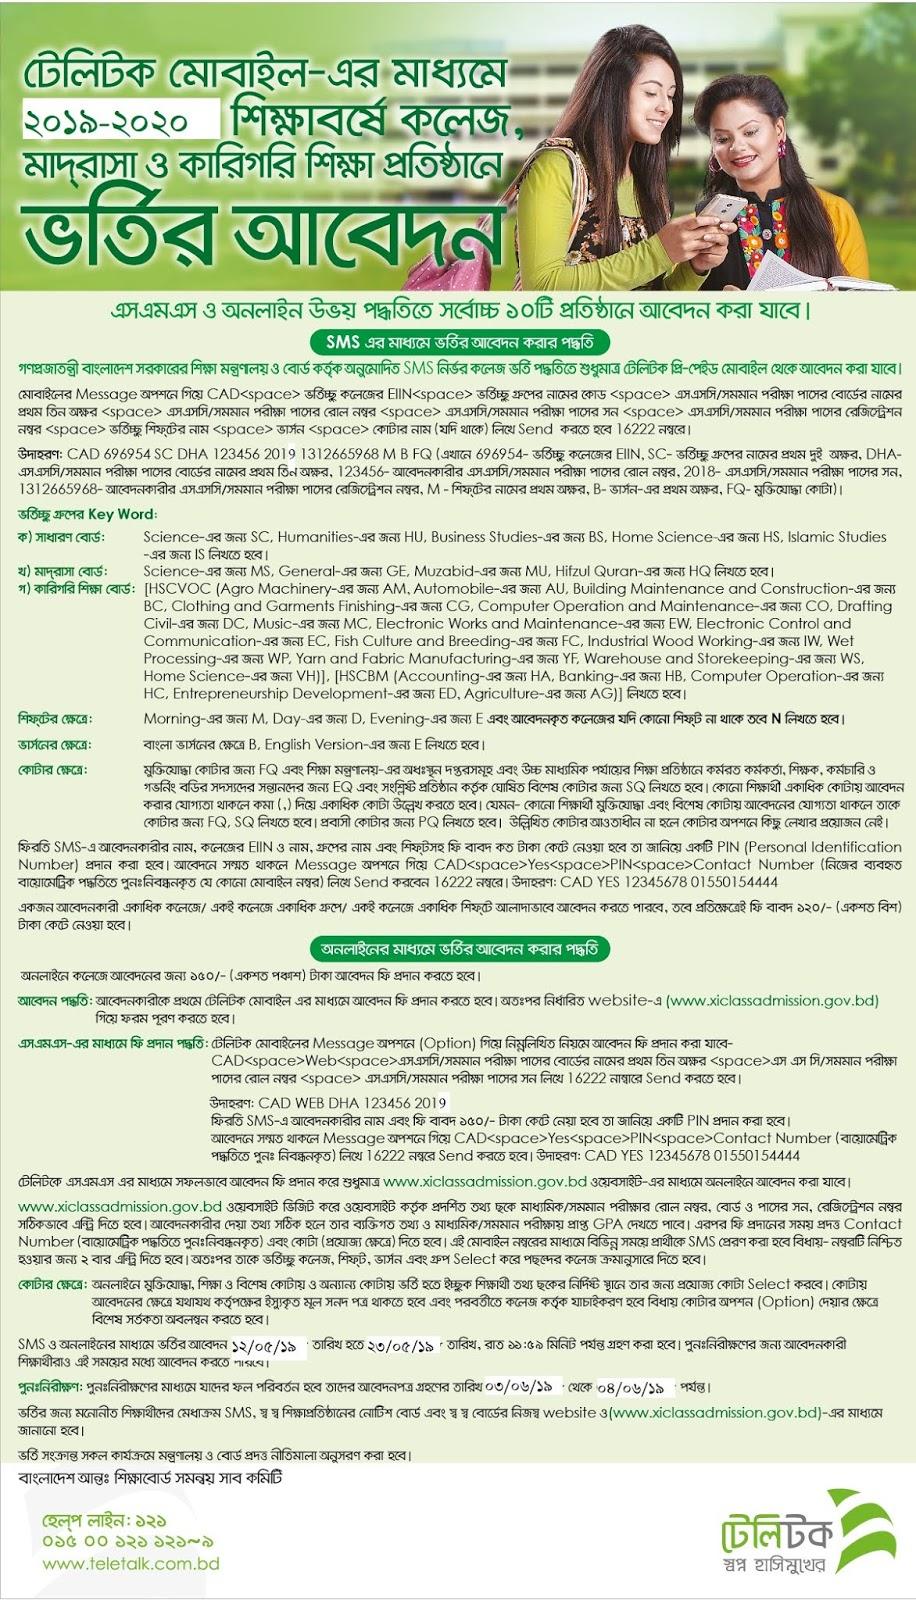 HSC Admission Circular 2019-2020